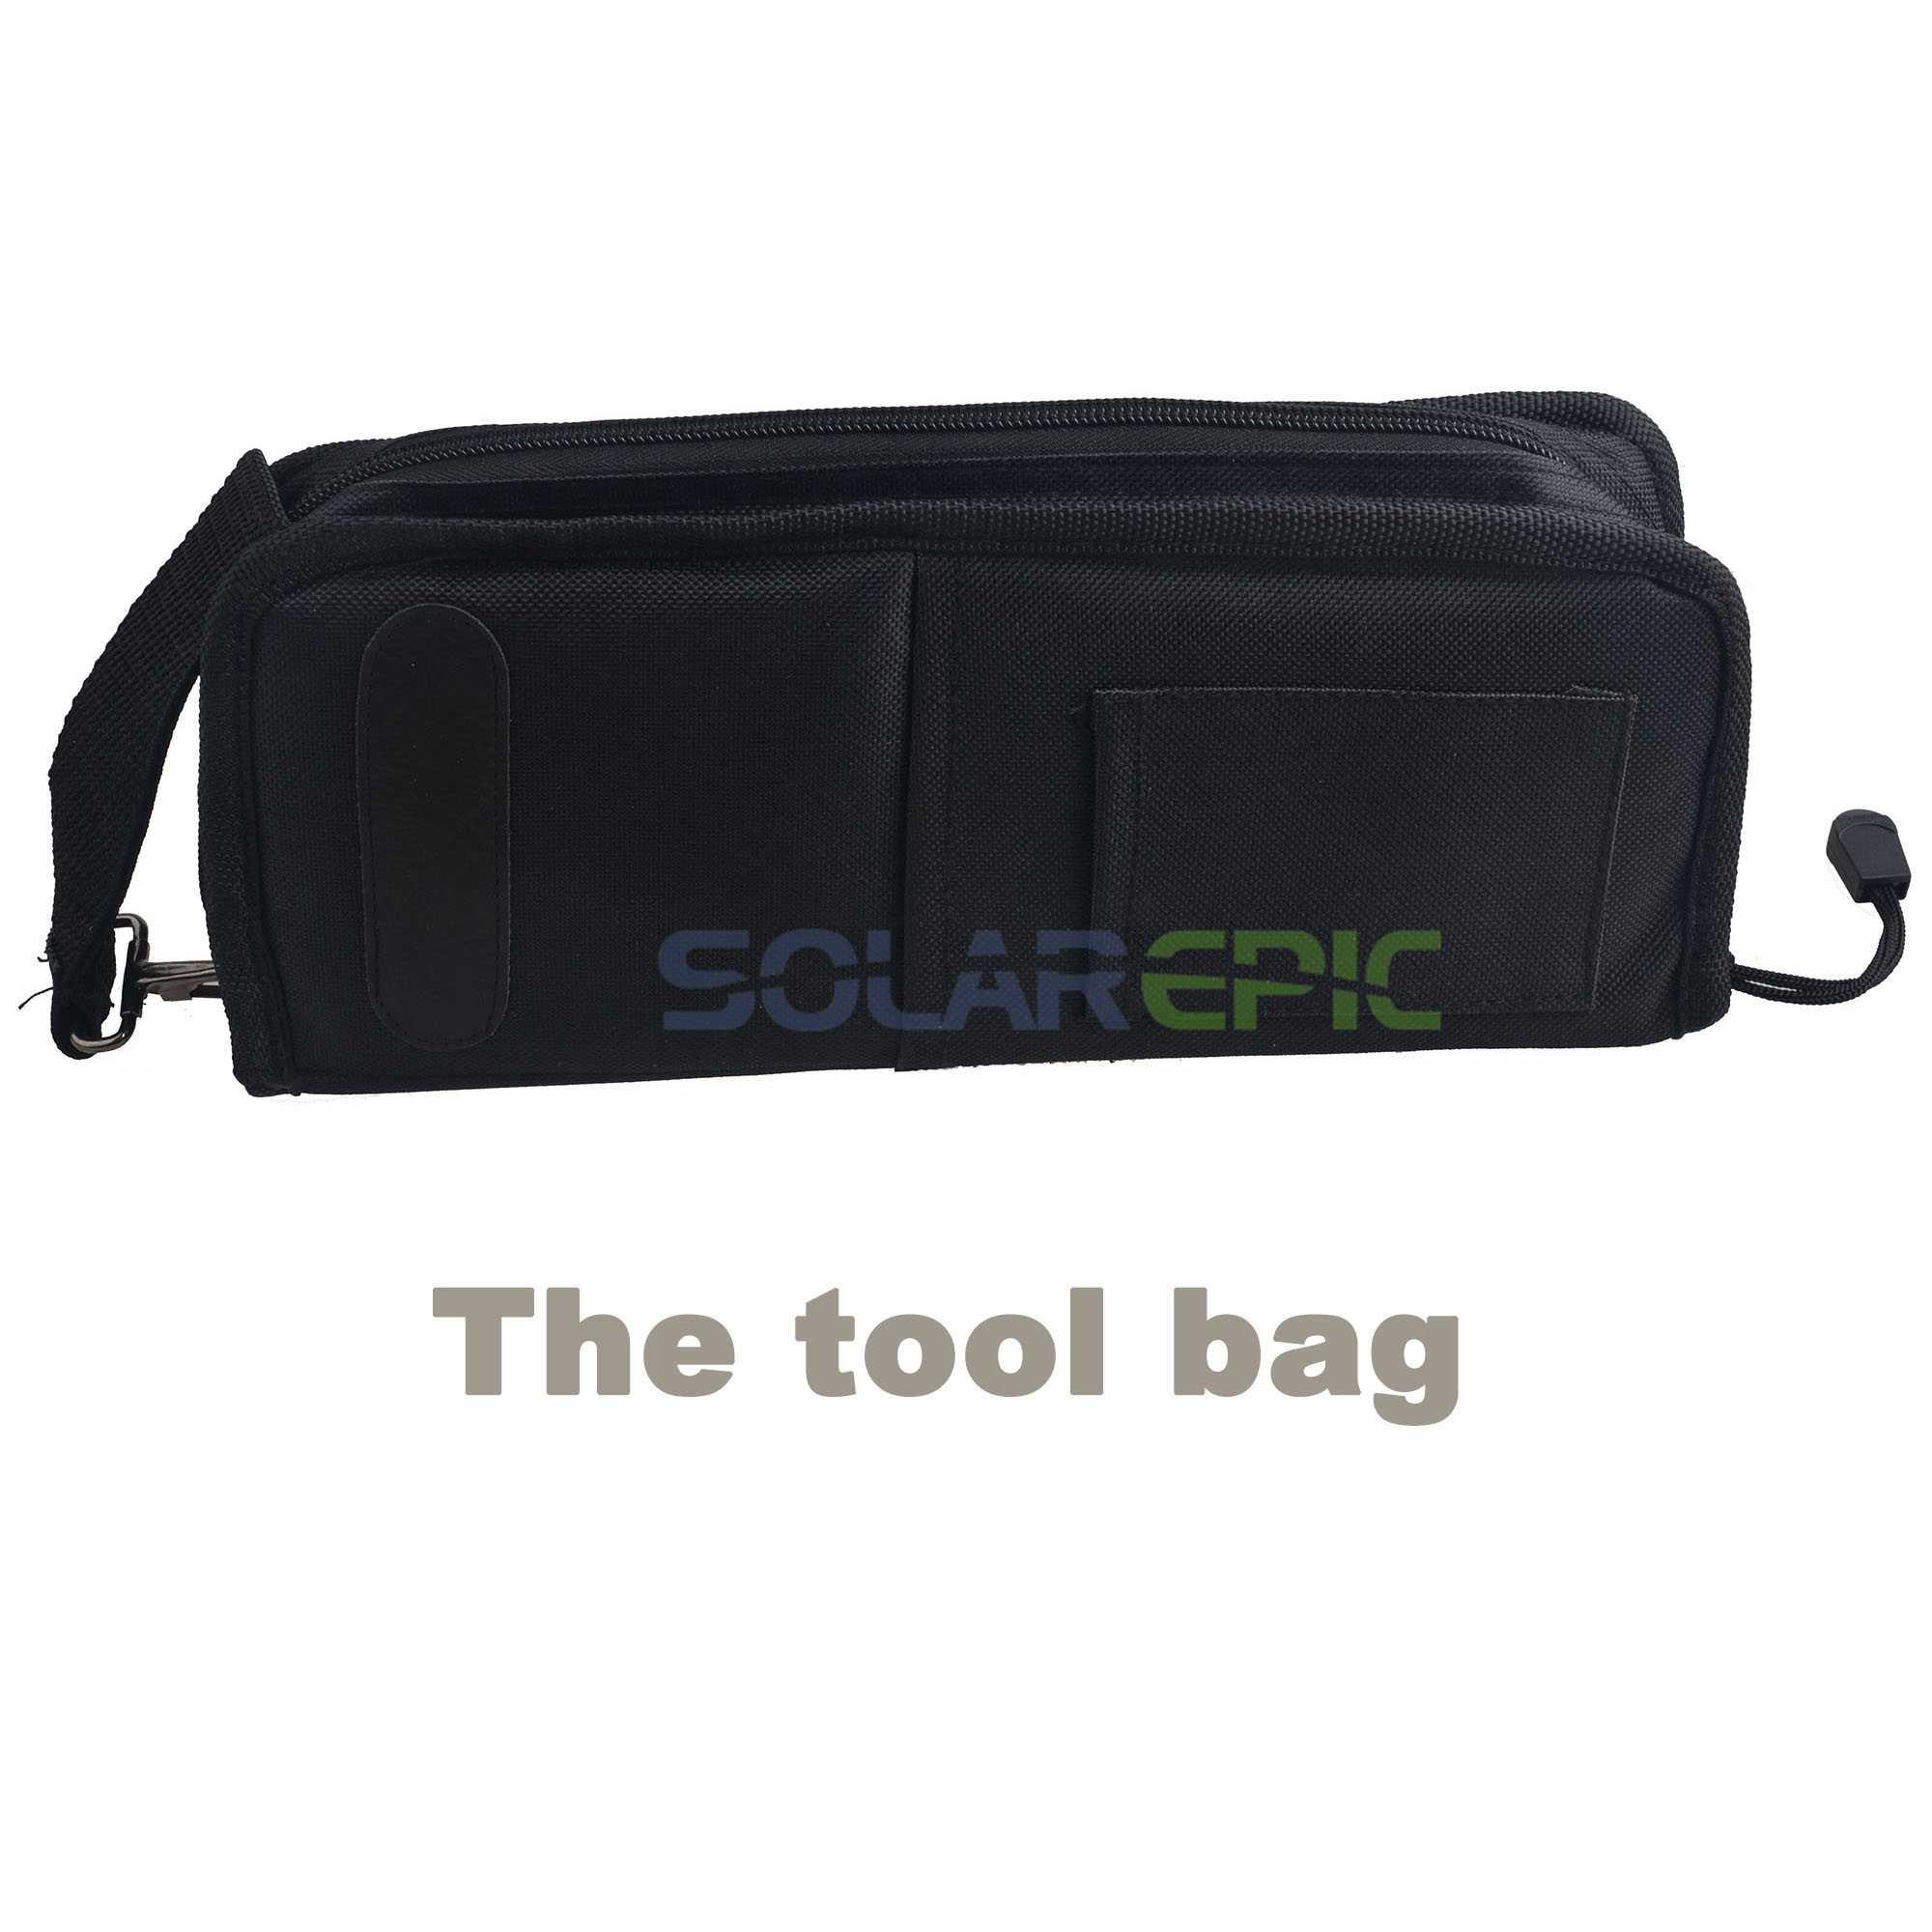 Conectores fotovoltaicos conjunto de ferramentas de friso terminal solar uso para painel solar painel solar cabo conector ferramenta crimpe